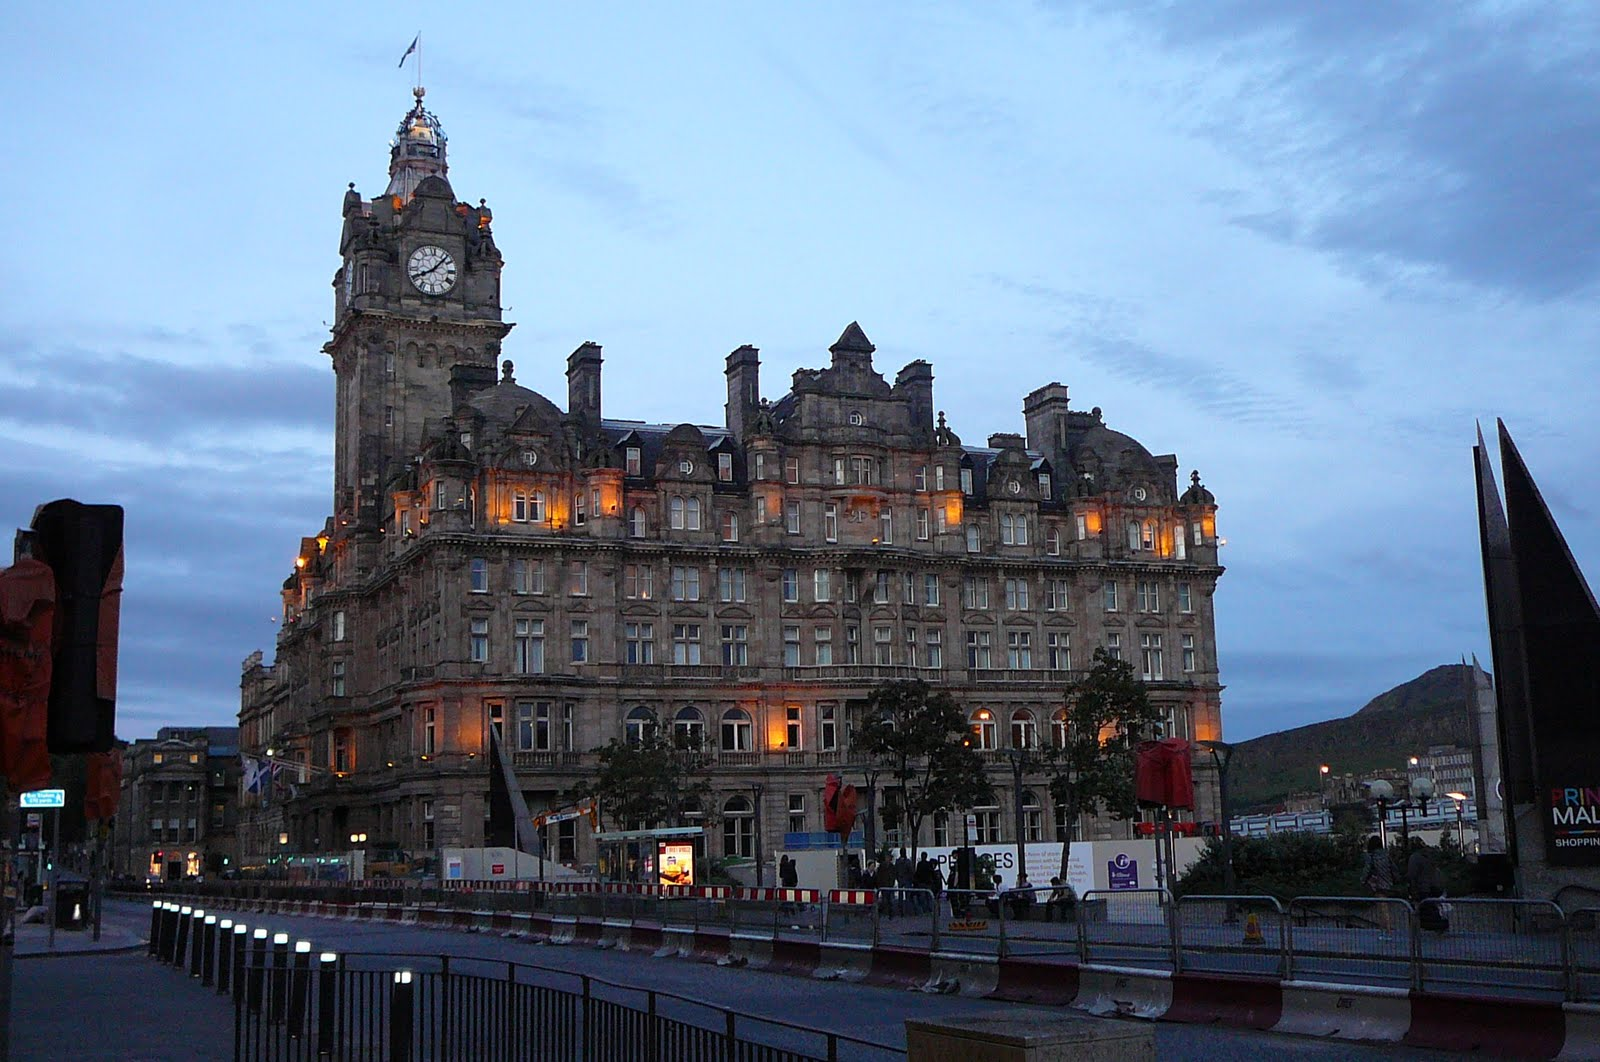 Kootenayman: Carlisle England to Edinburgh Scotland